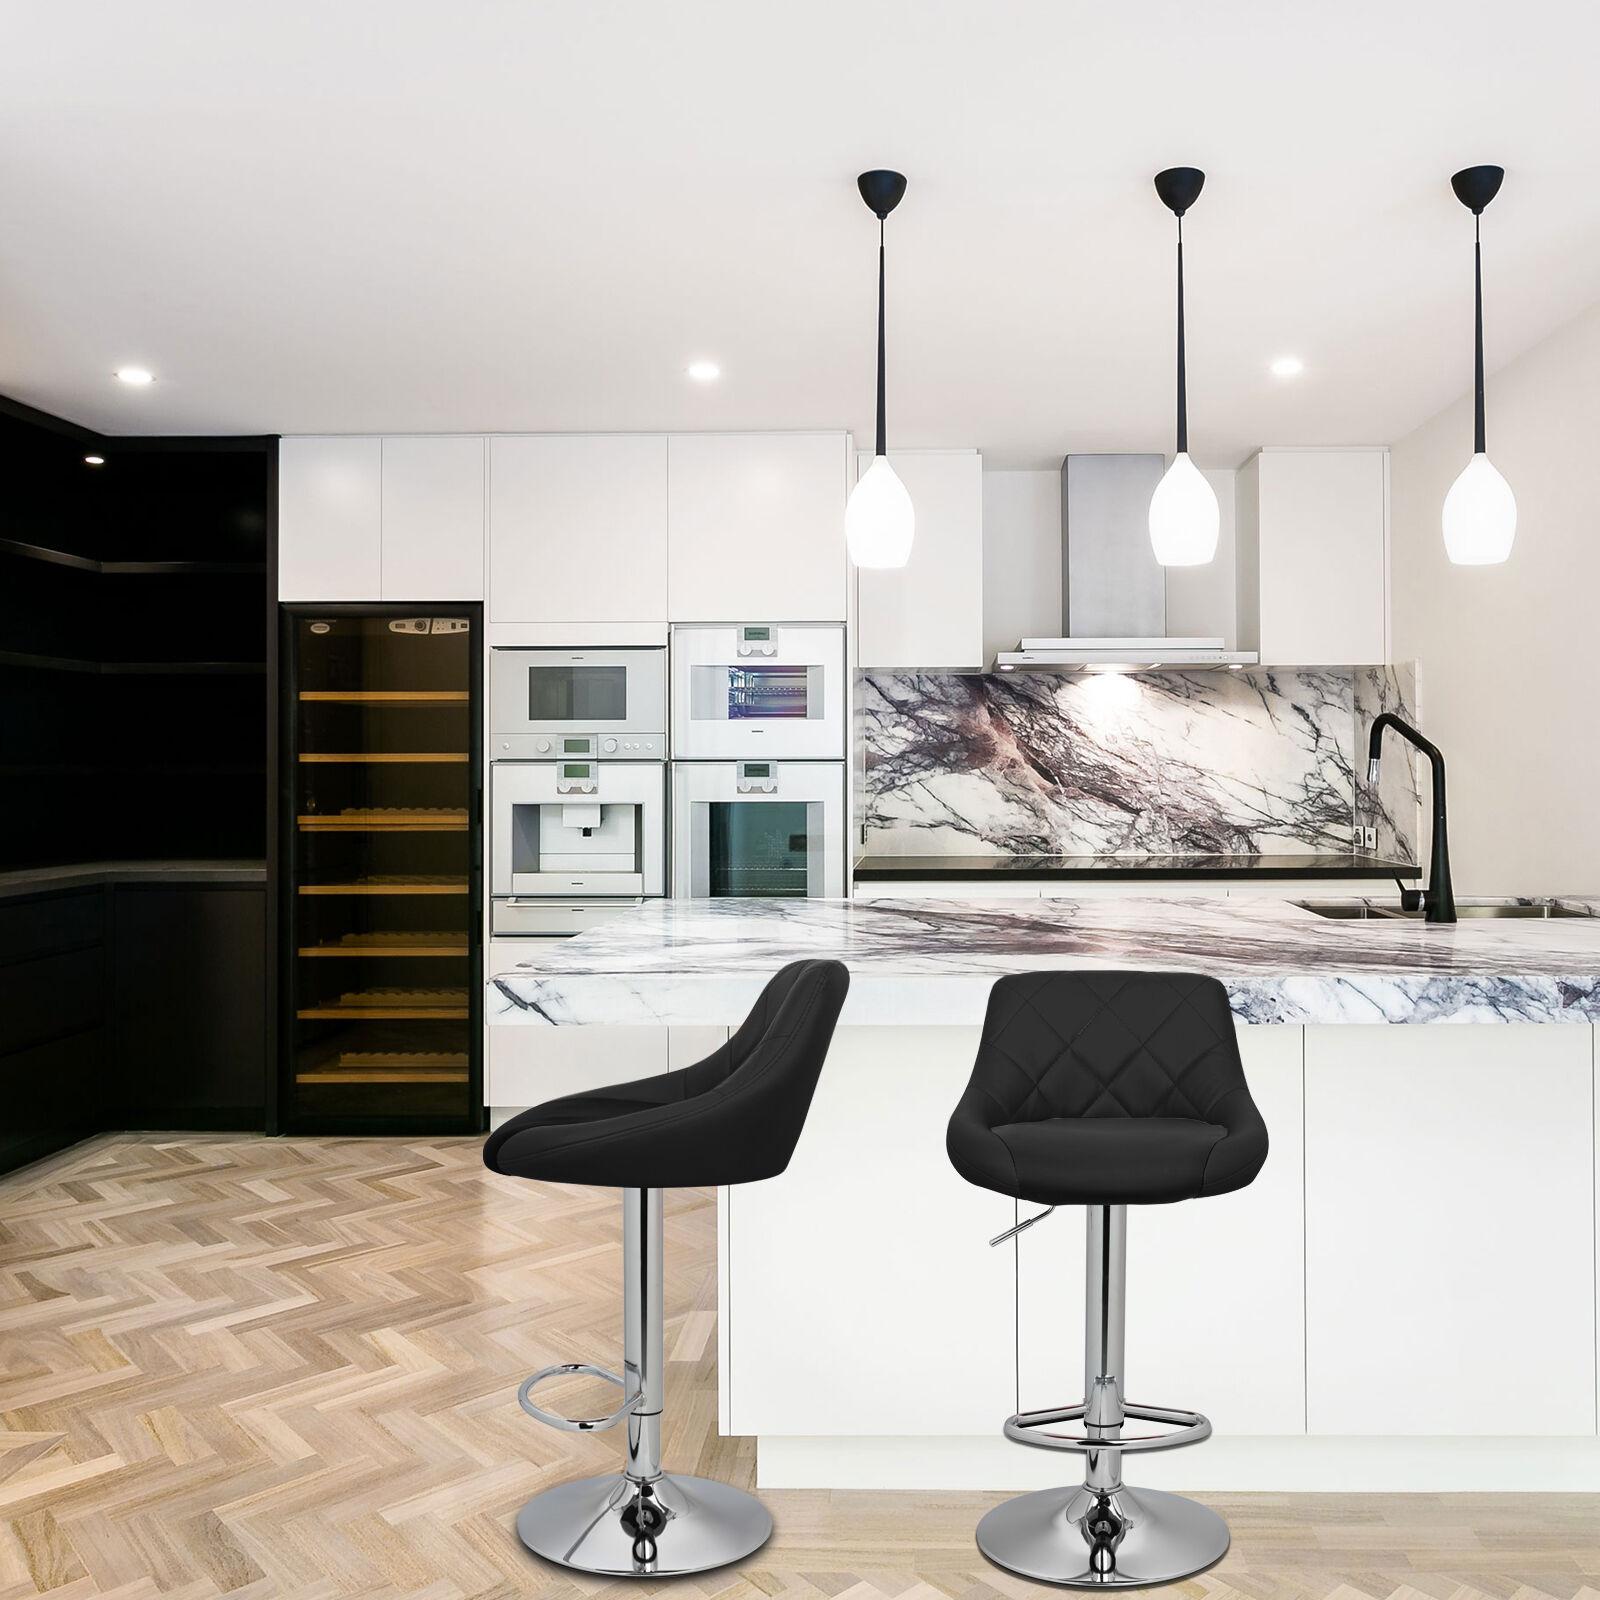 2017 Model Microfiber Black Bar Stool Chair Adjustable